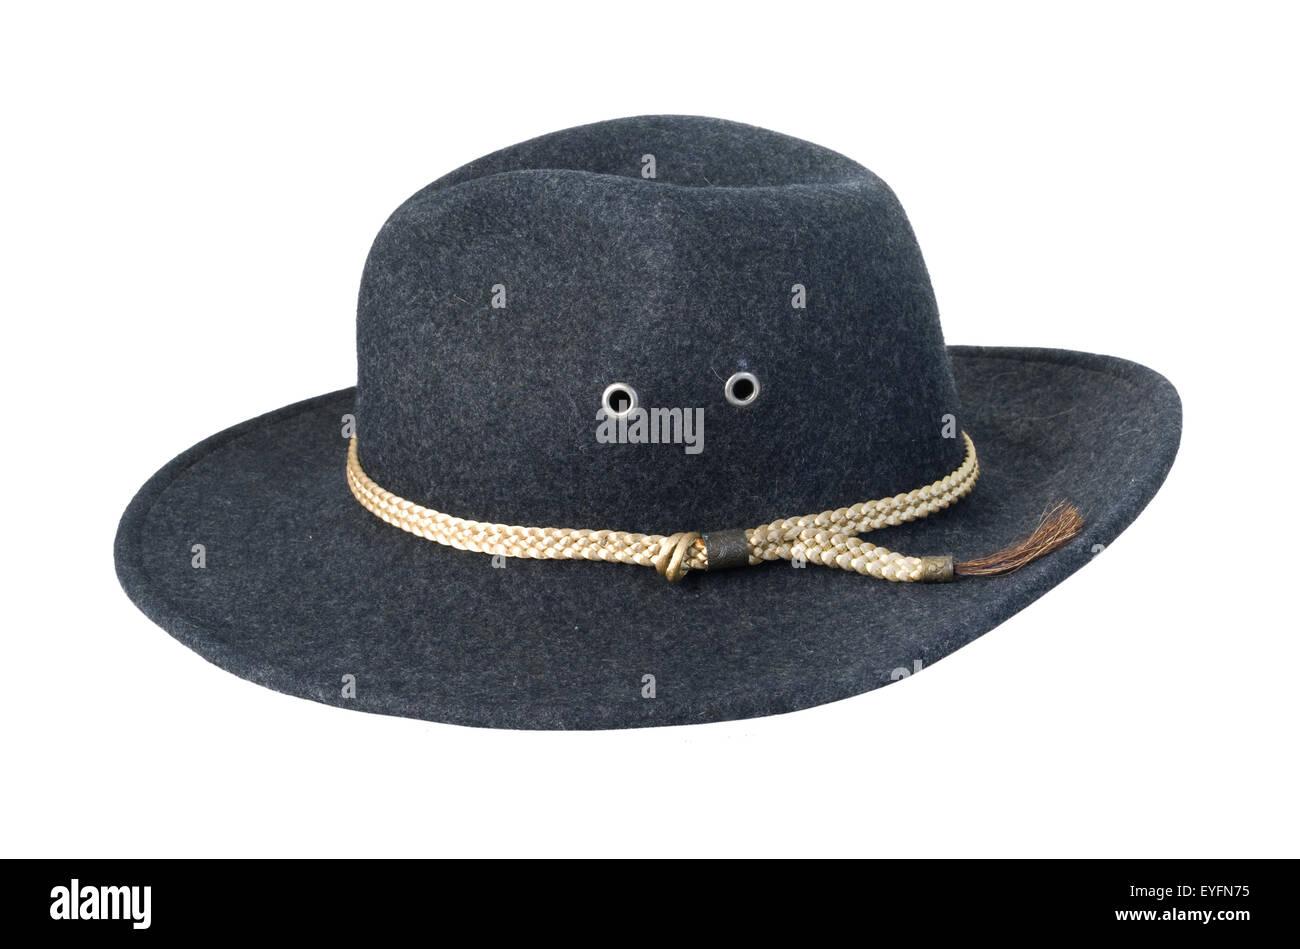 Sombrero de fieltro oscuro con cable trenzado - Ruta incluida Imagen De  Stock 0588b9c547a